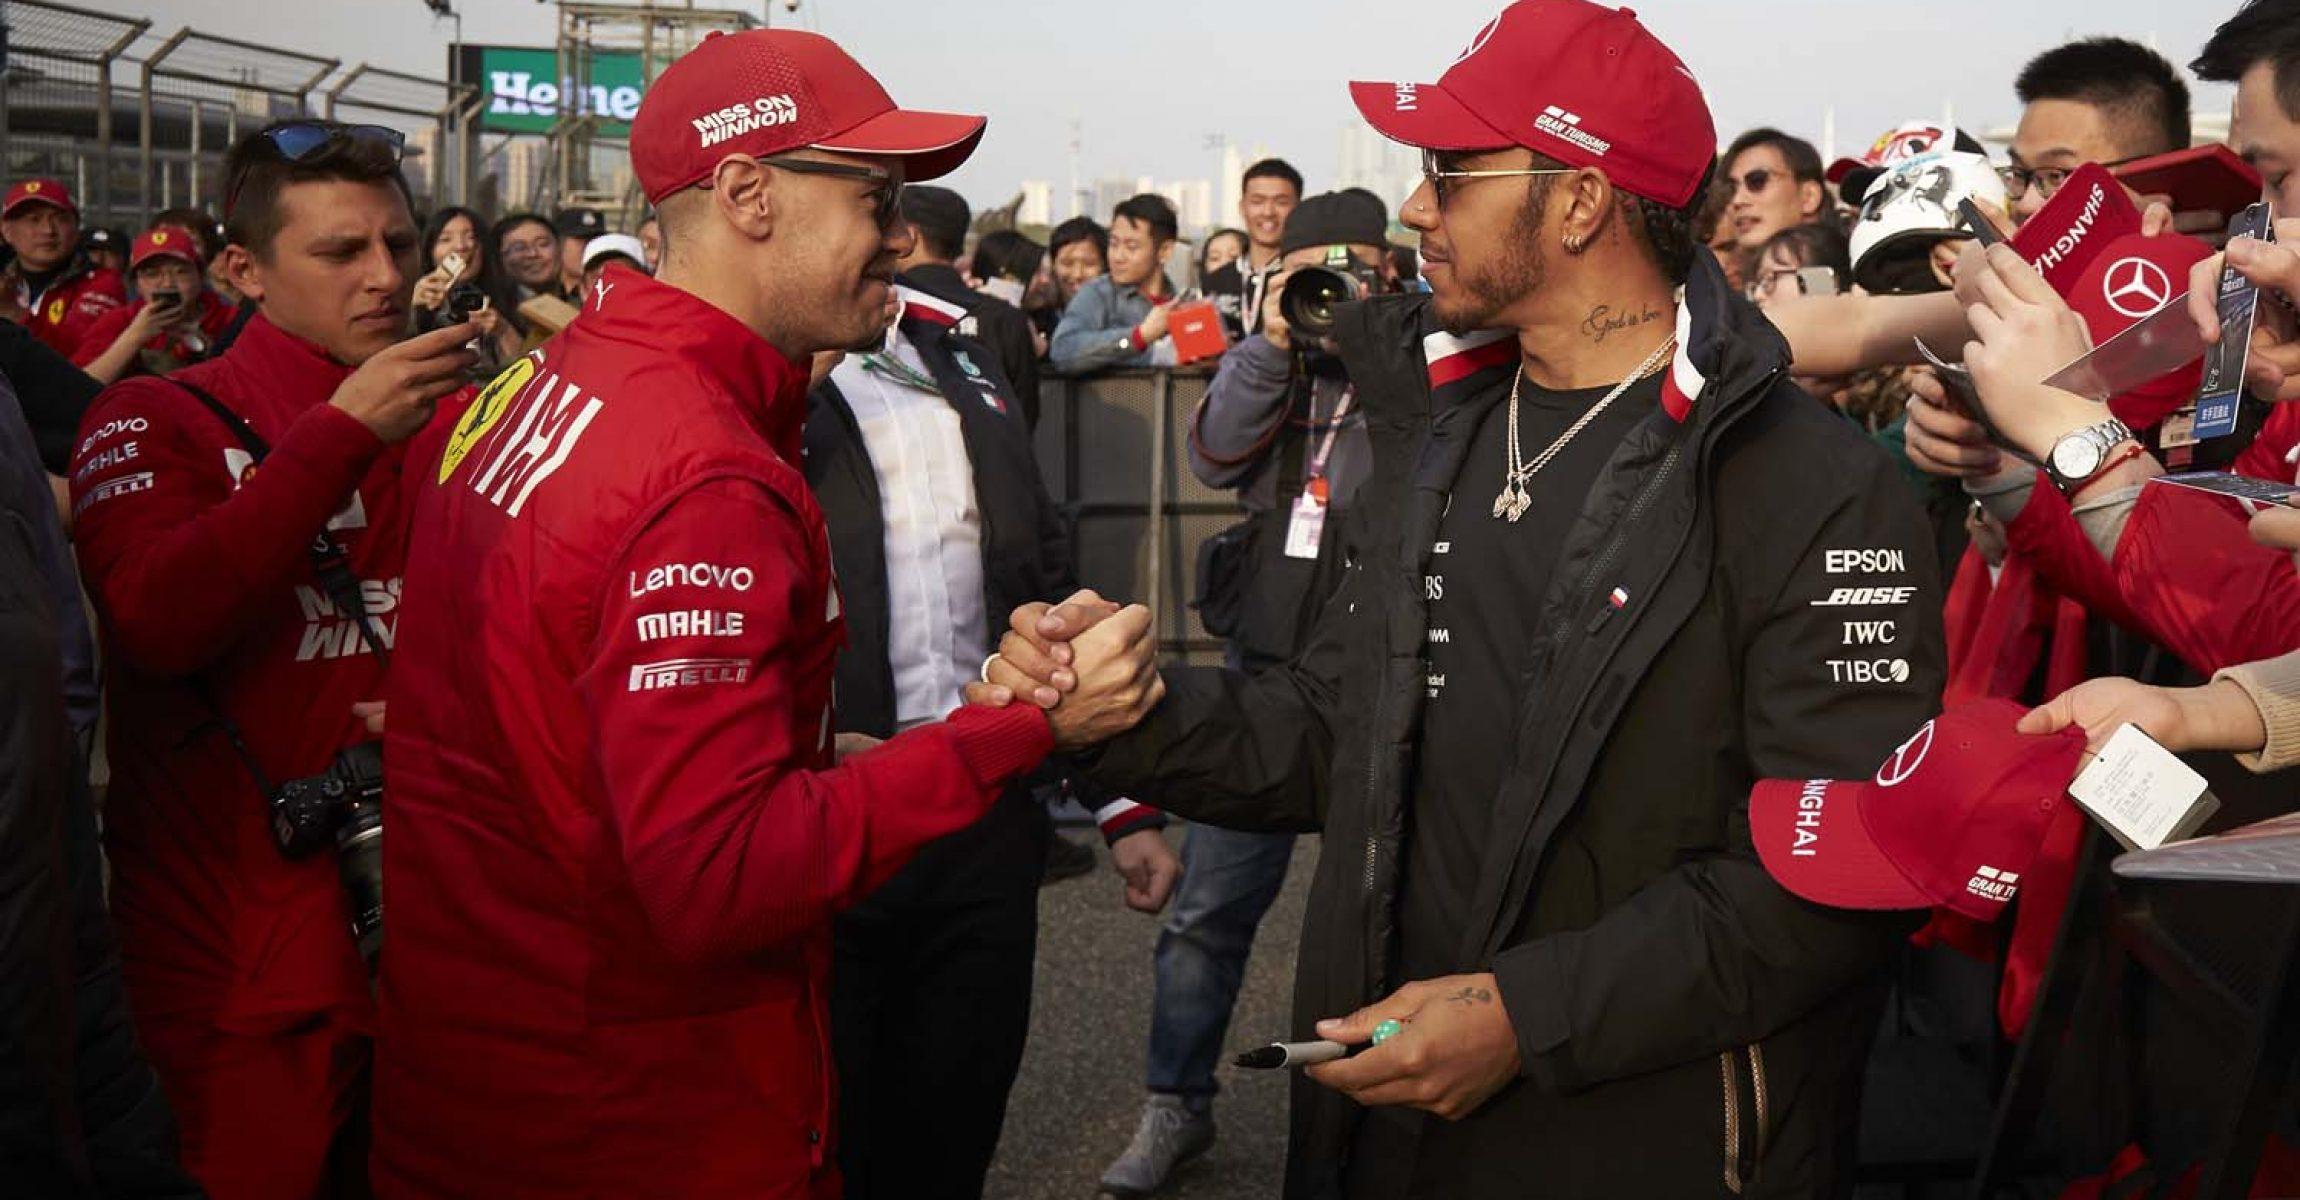 2019 Chinese Grand Prix, Thursday - Steve Etherington Sebastian Vettel, Lewis Hamilton